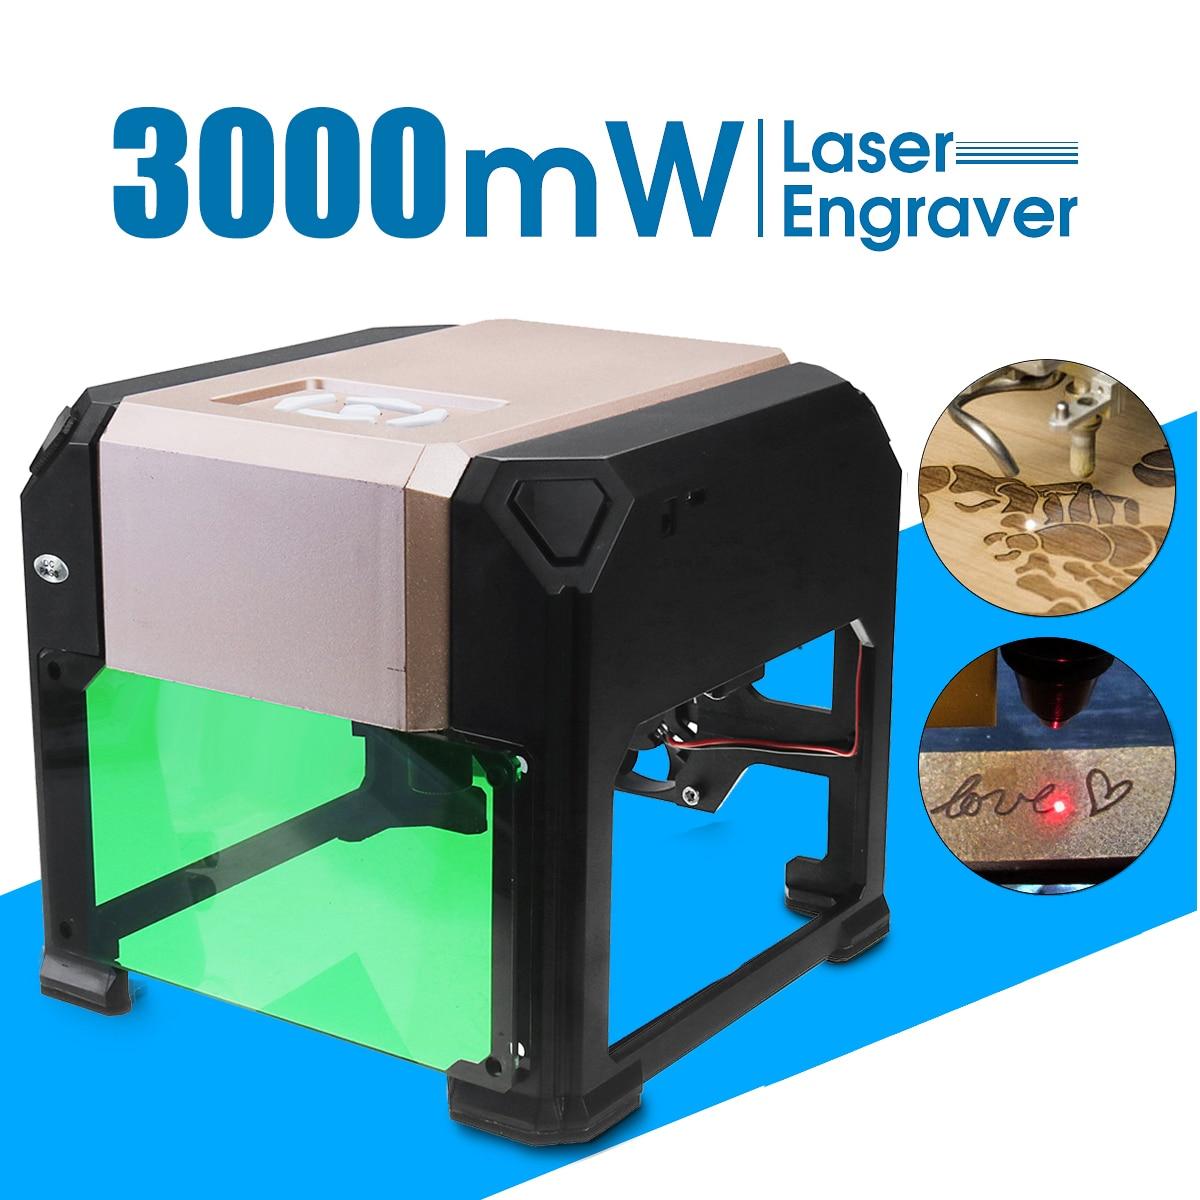 2000/3000 mw 레이저 조각기 diy 로고 마크 프린터 커터 레이저 조각 기계 mac os 시스템 용 win 용 가정용